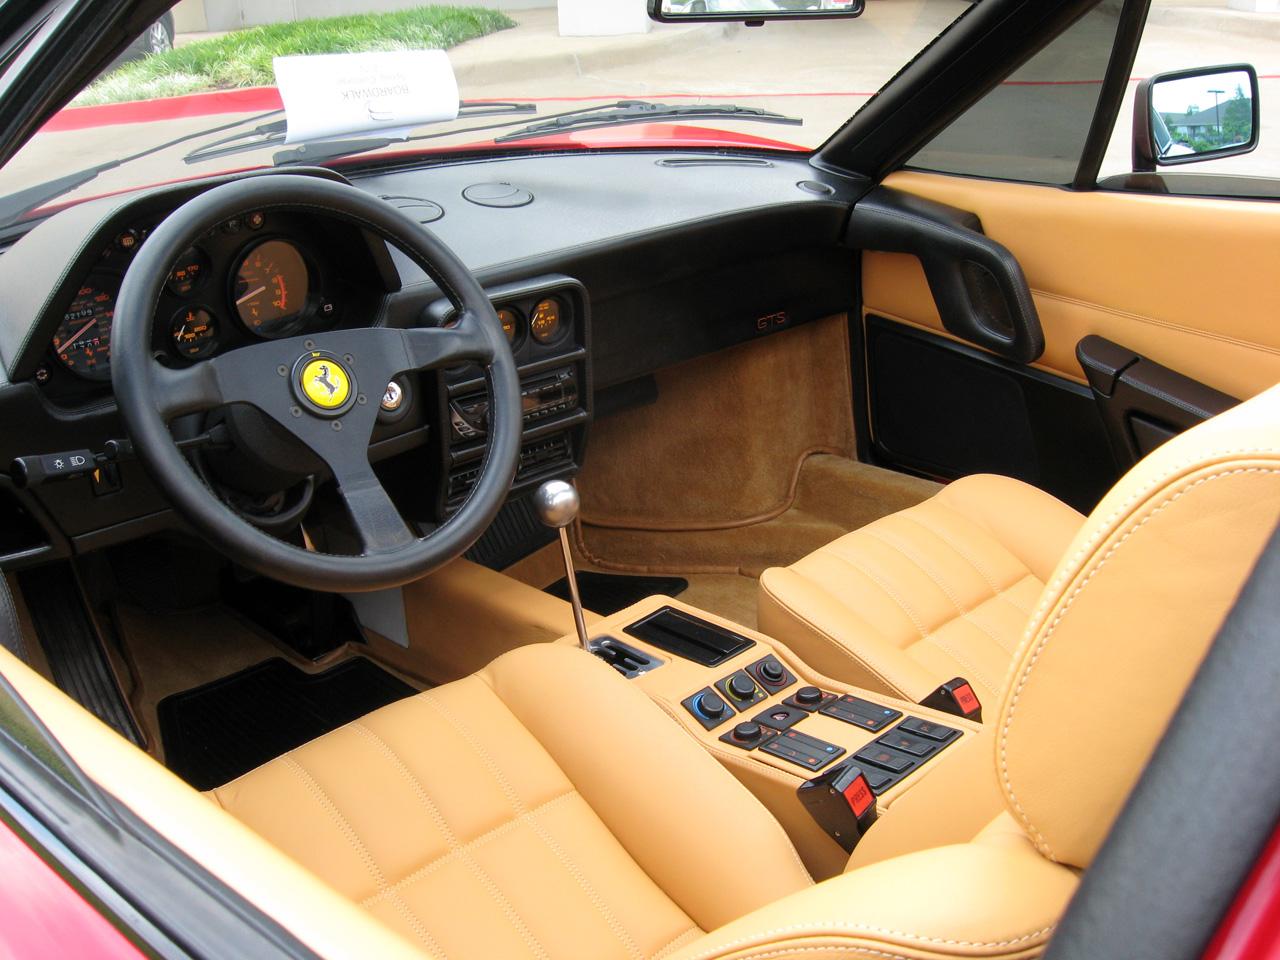 Gts Big on Alfa Romeo Spider 1988